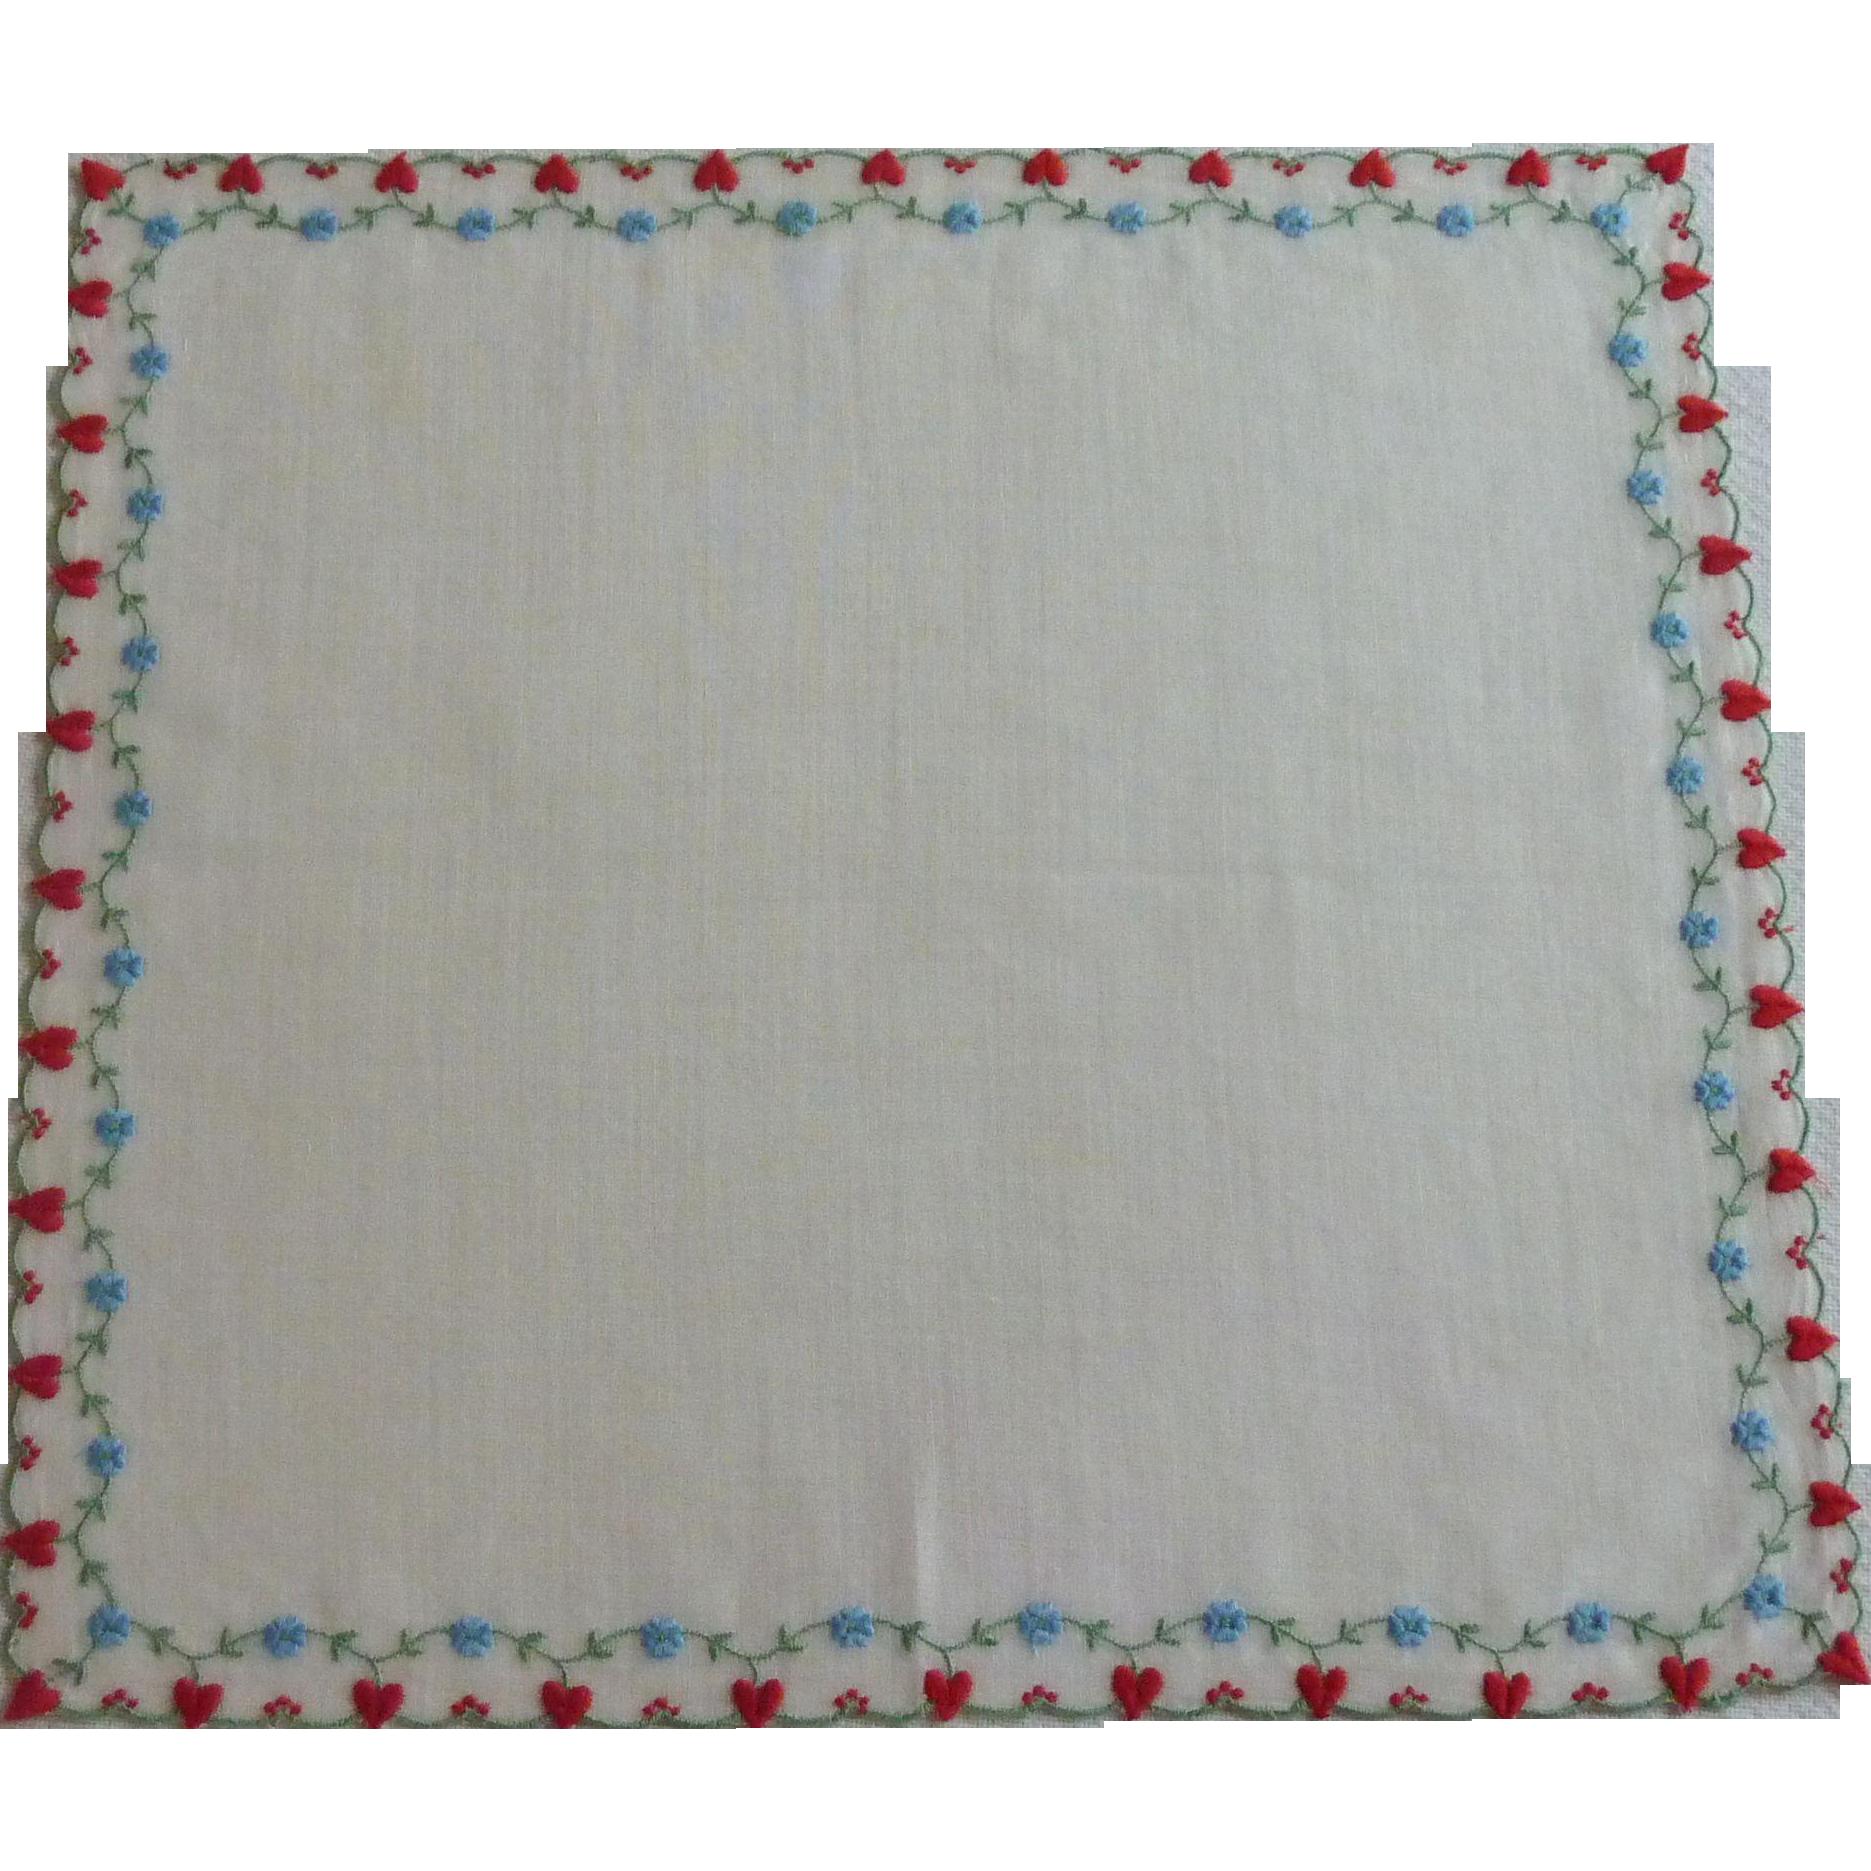 Red Hearts & Blue Flowers Valentine Handkerchief Hankie Hanky